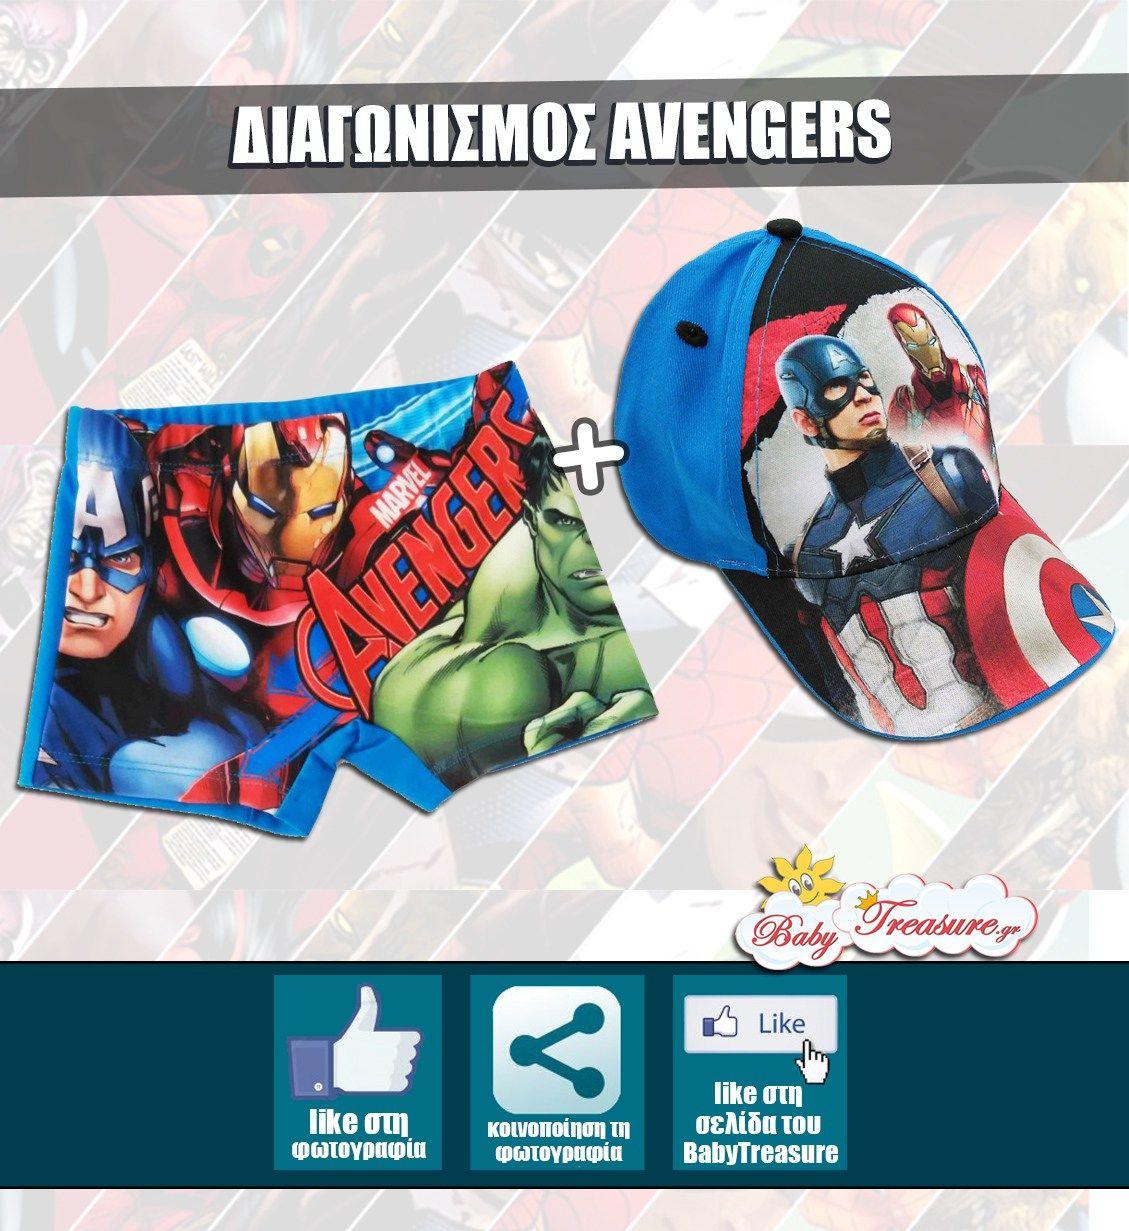 716bceab45c Διαγωνισμός με δώρο ένα παιδικό μαγιό & καπέλο των Avengers! - https:/